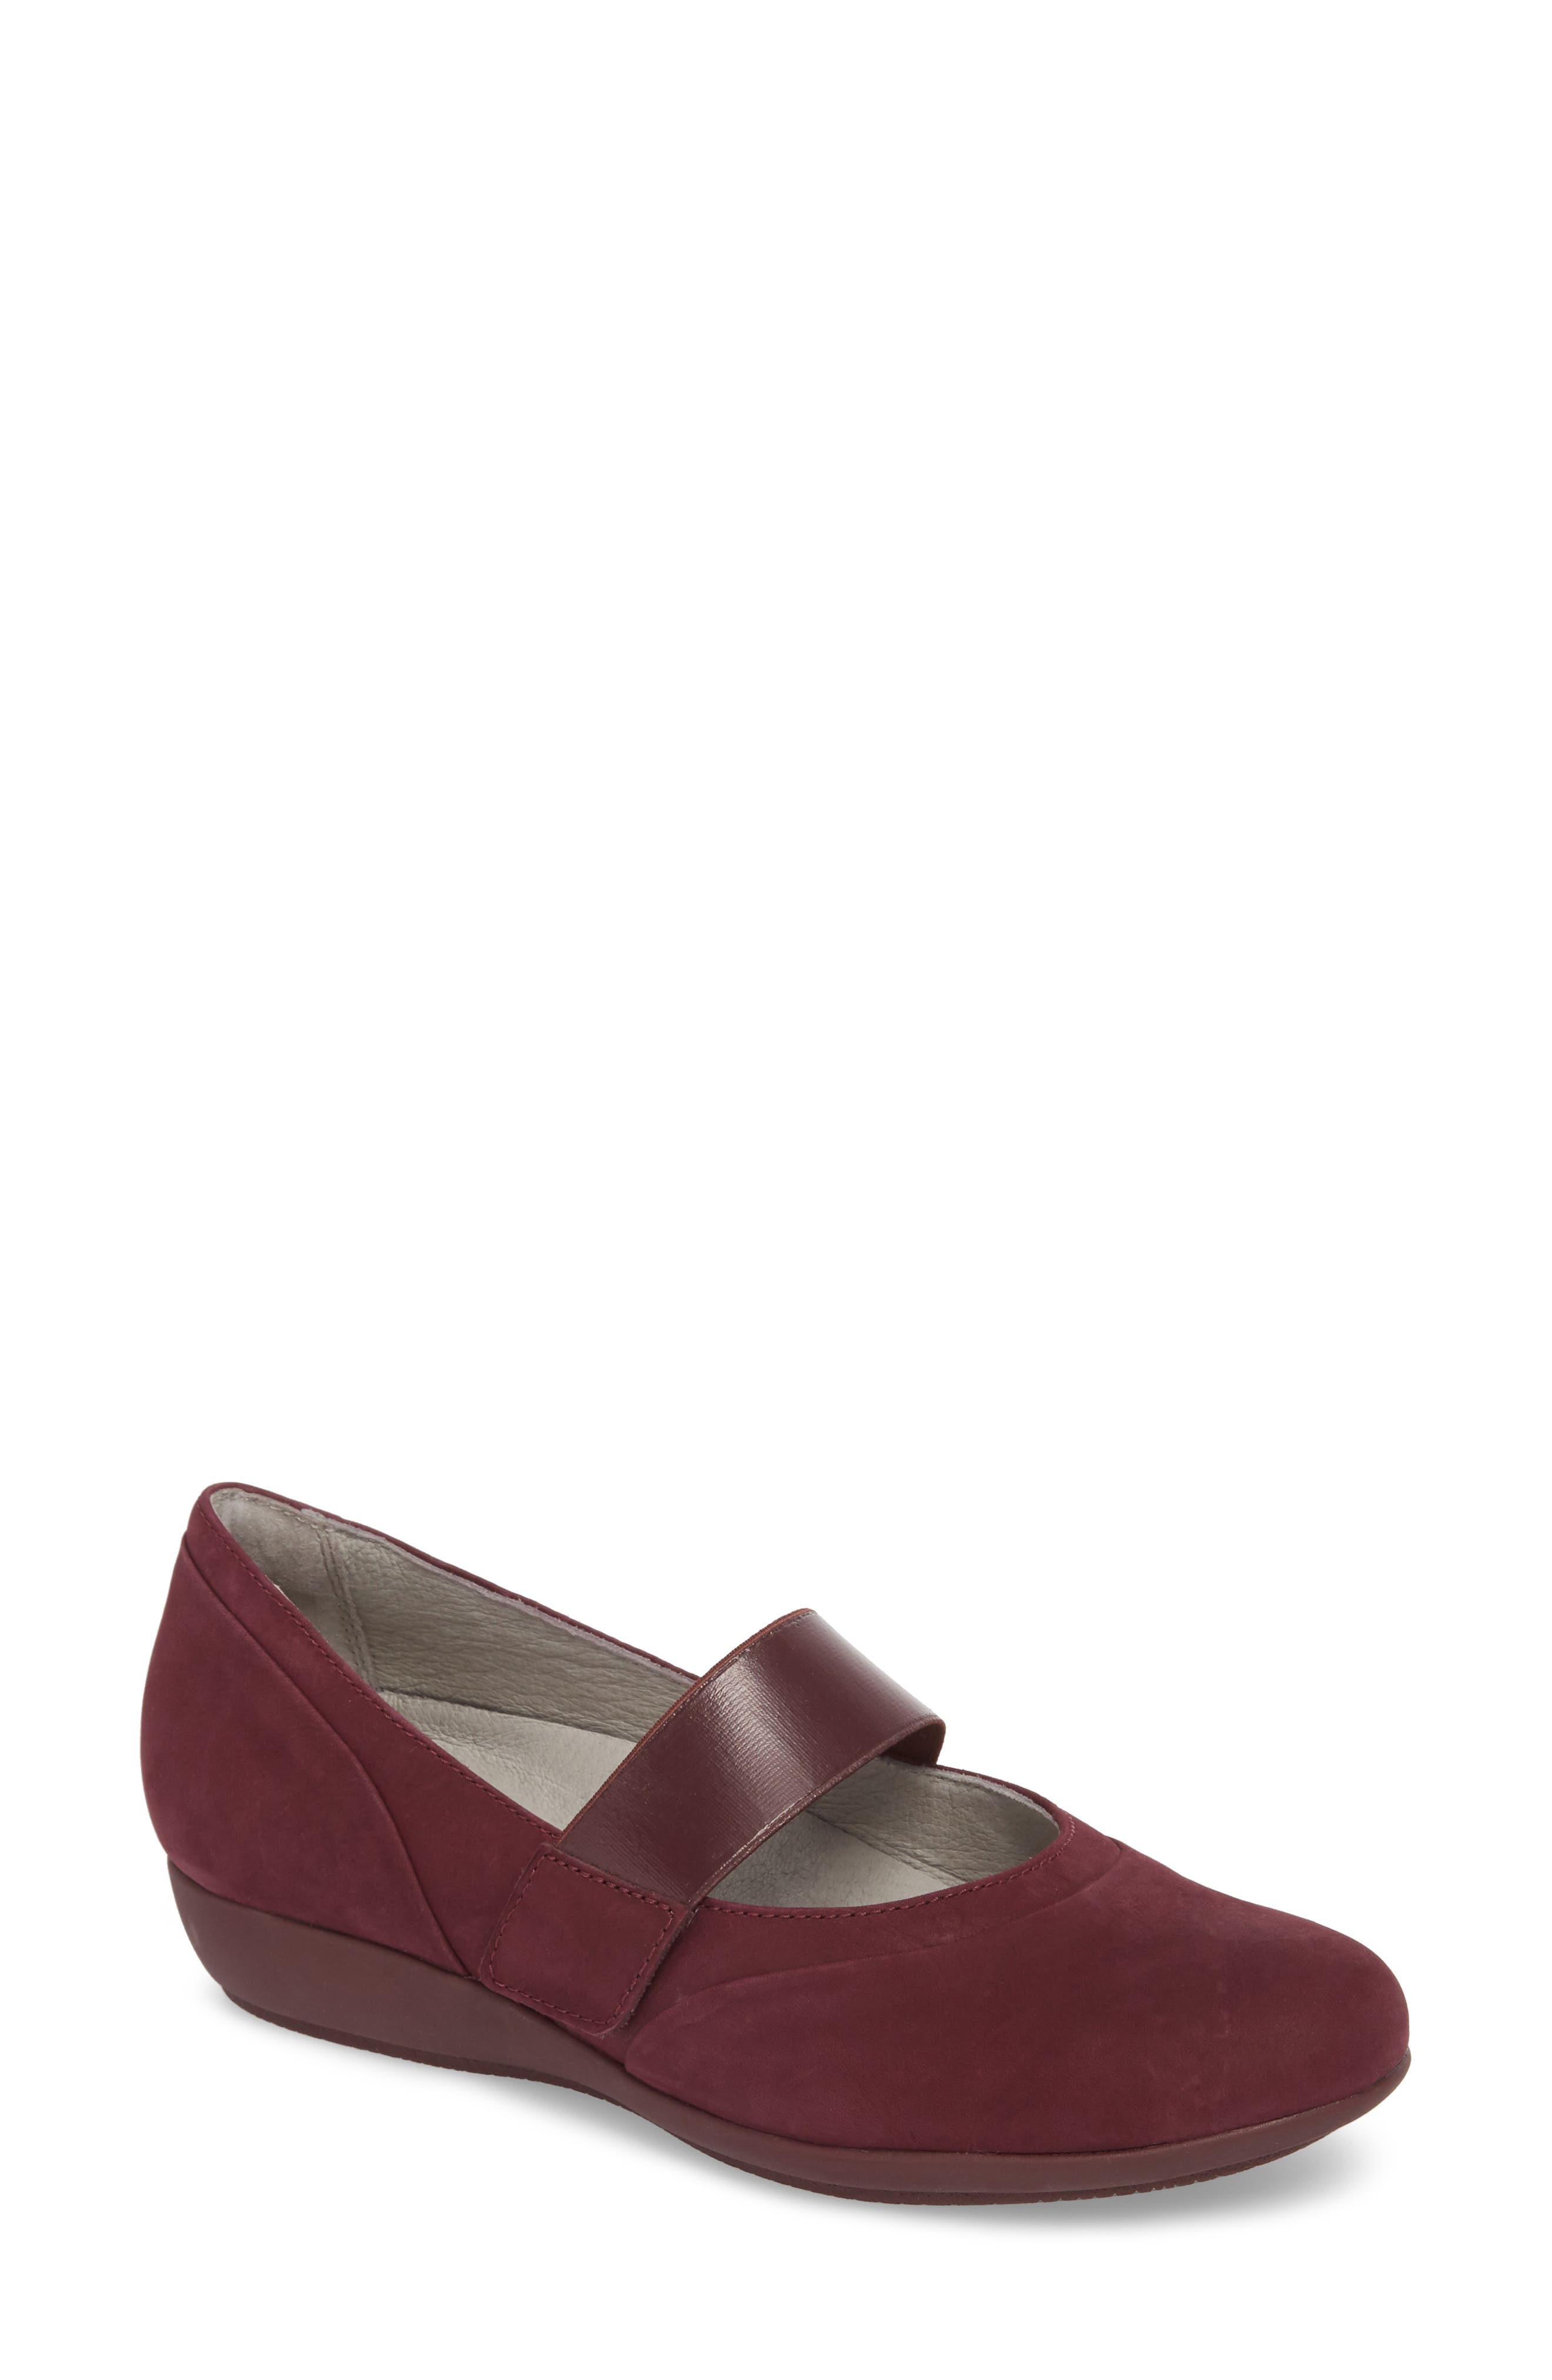 Dansko Kendra Mary Jane Wedge-6- Red